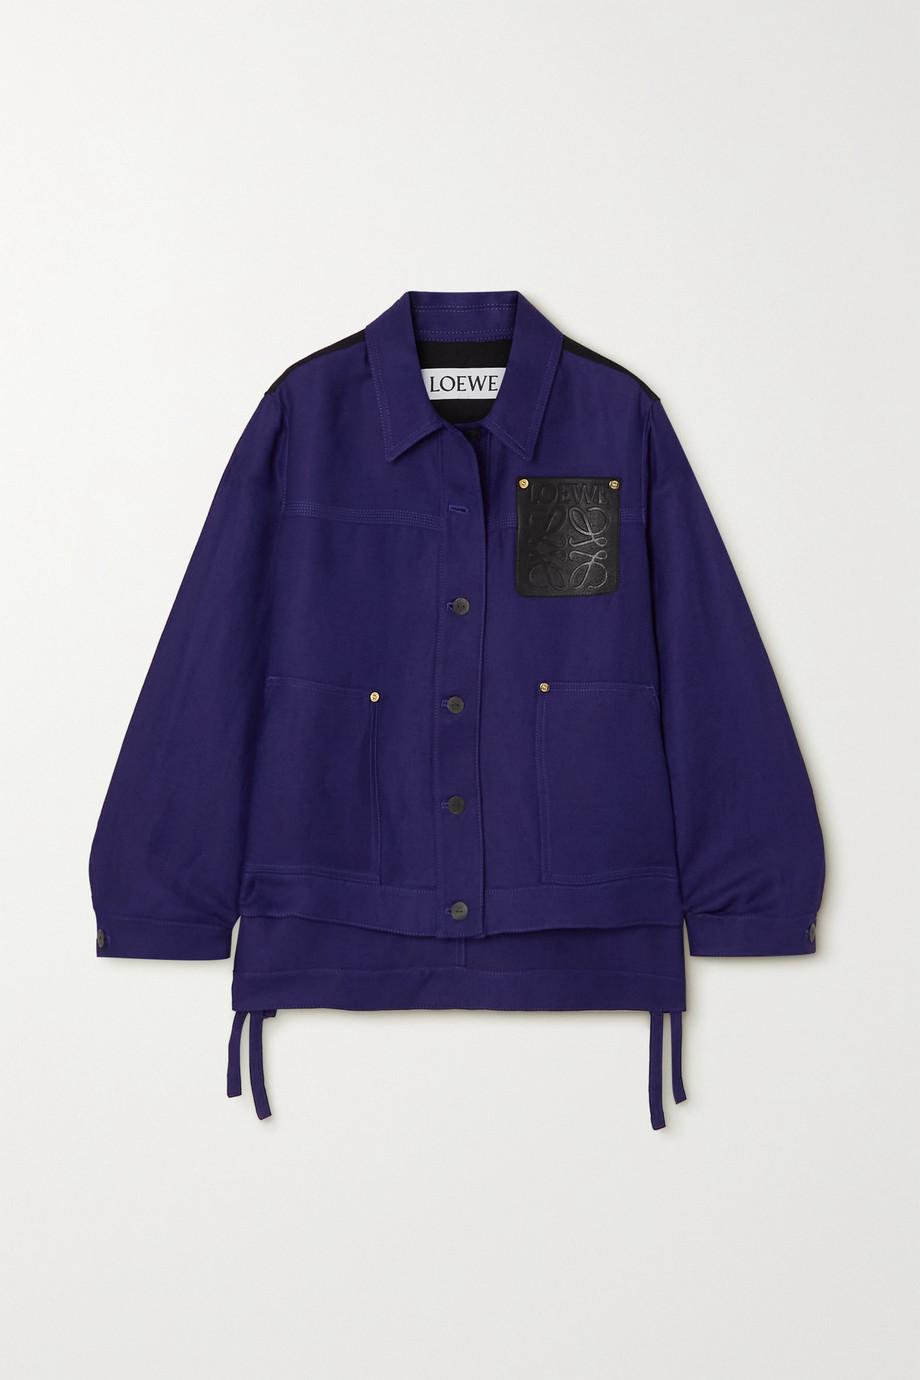 Loewe Leather-trimmed linen-blend drill jacket